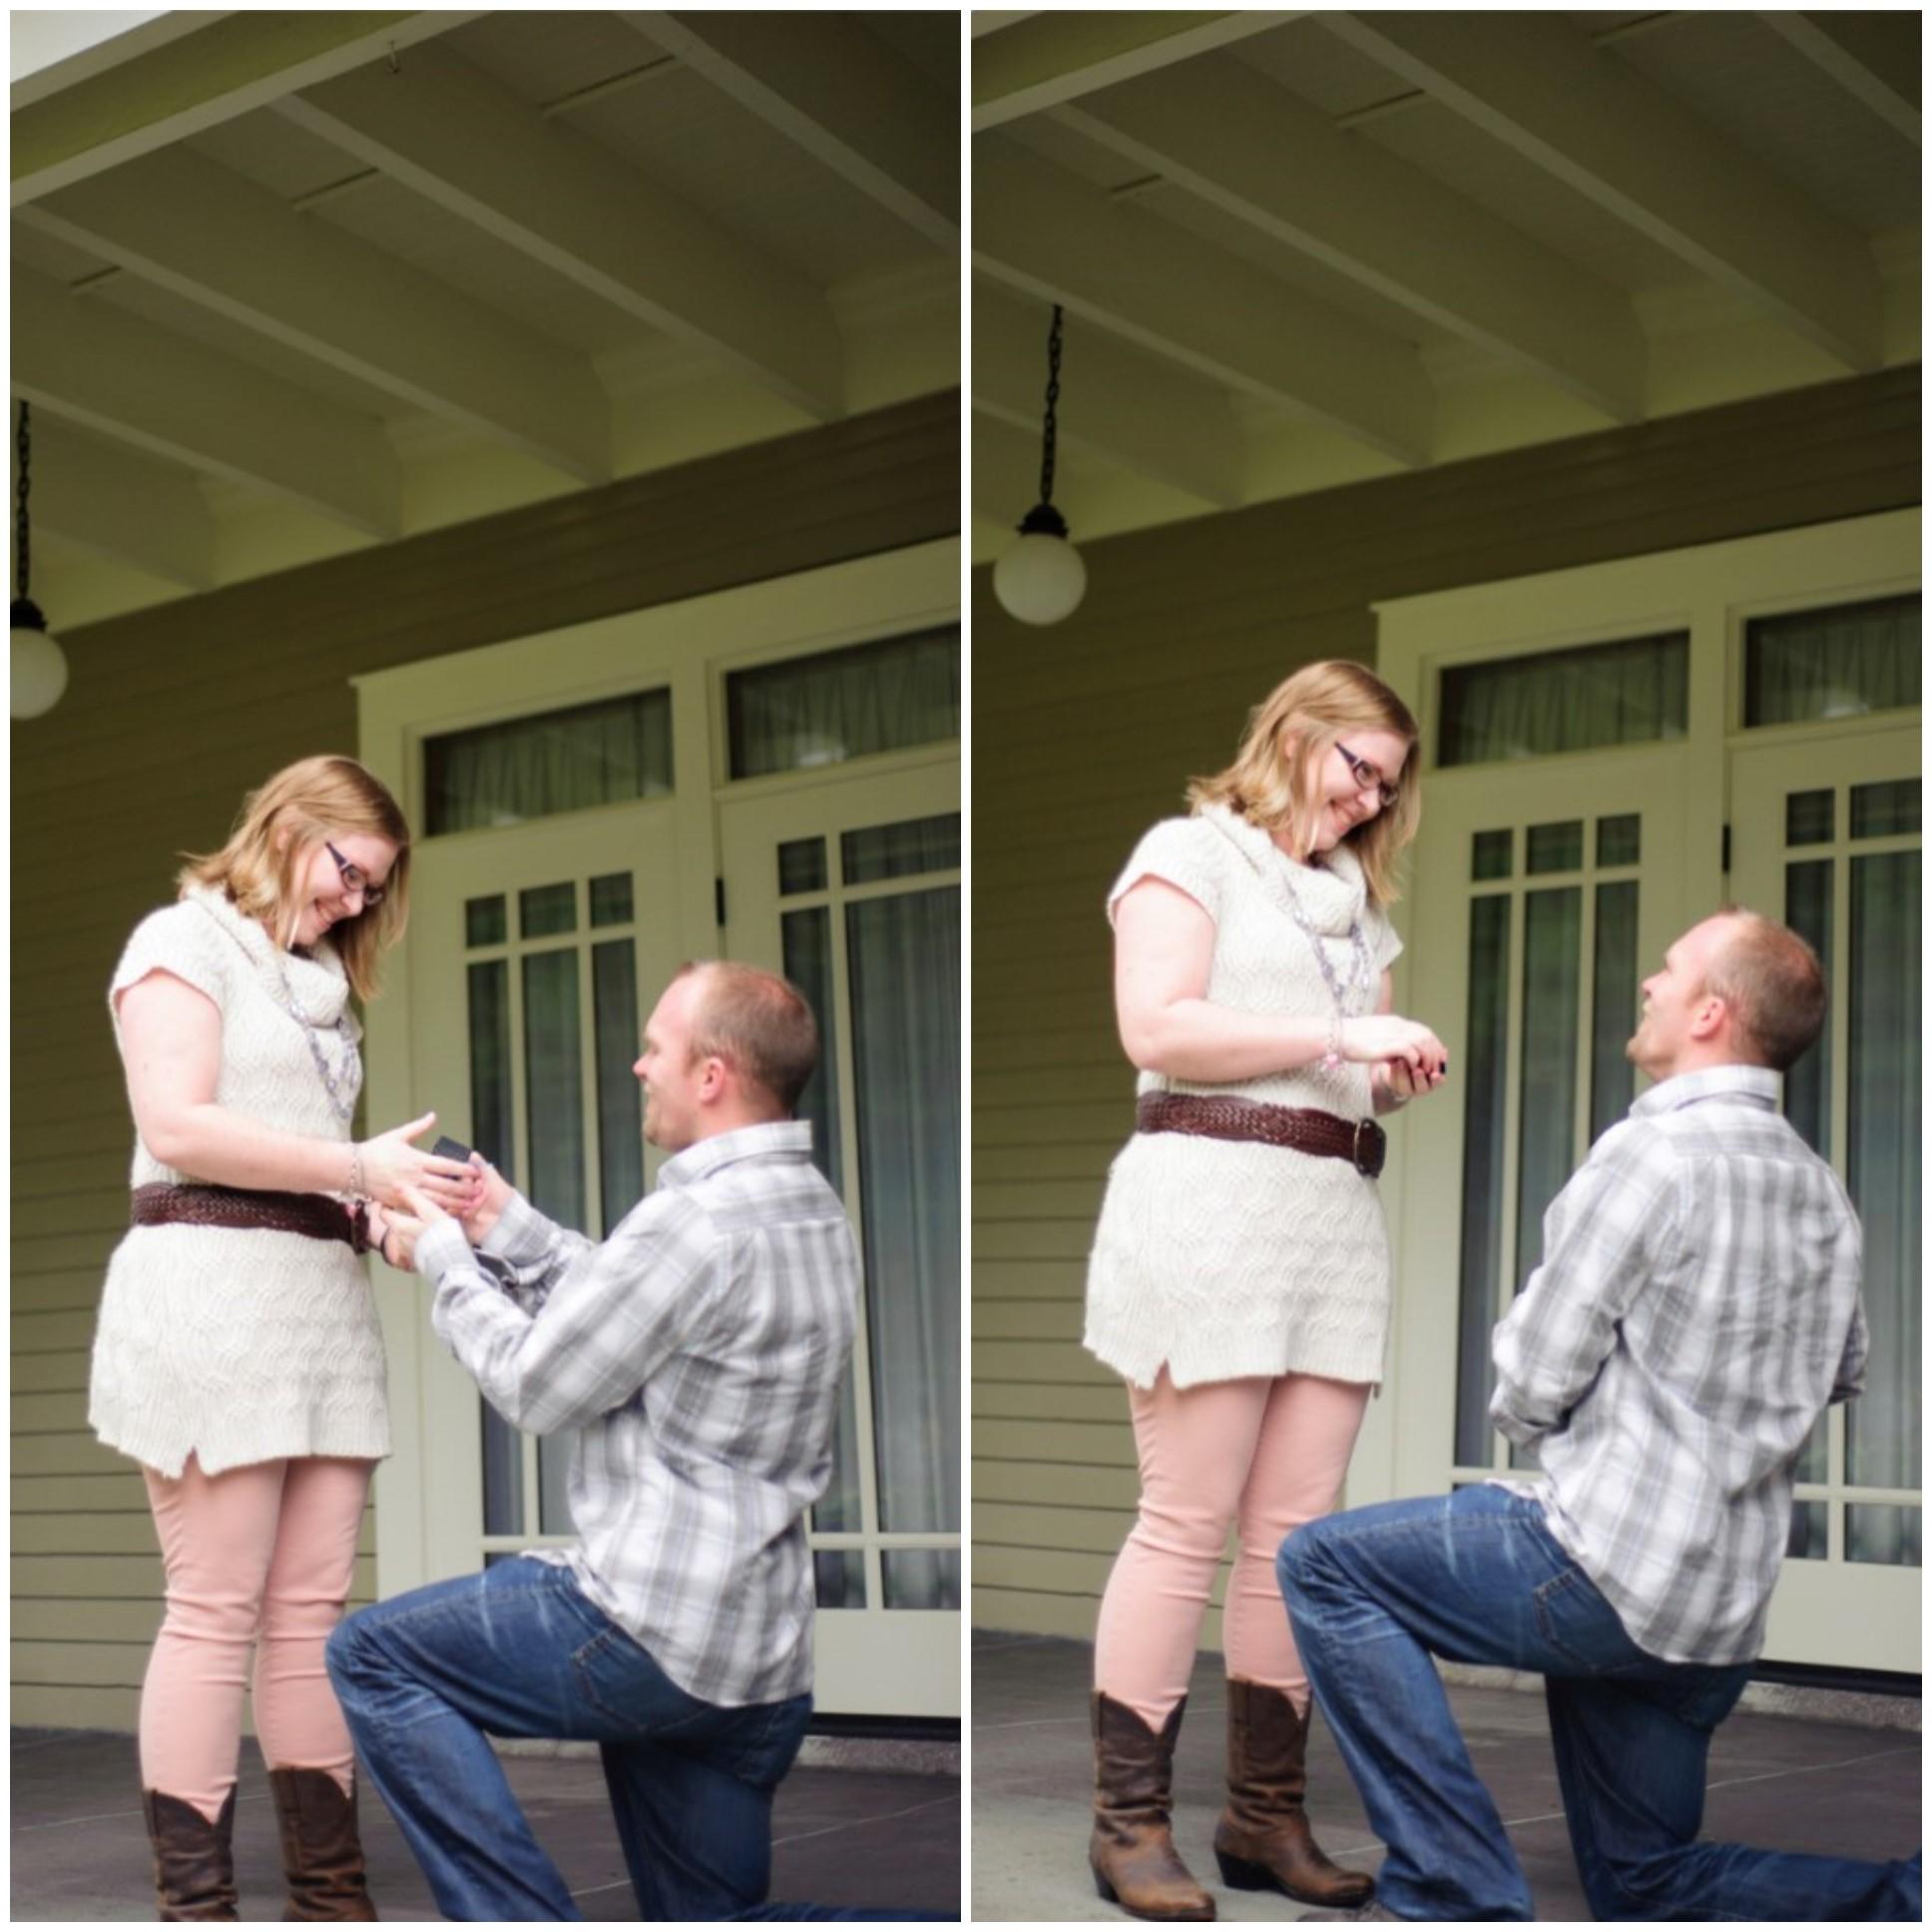 Image 12 of Nicholas and Melissa's Photo Shoot Proposal